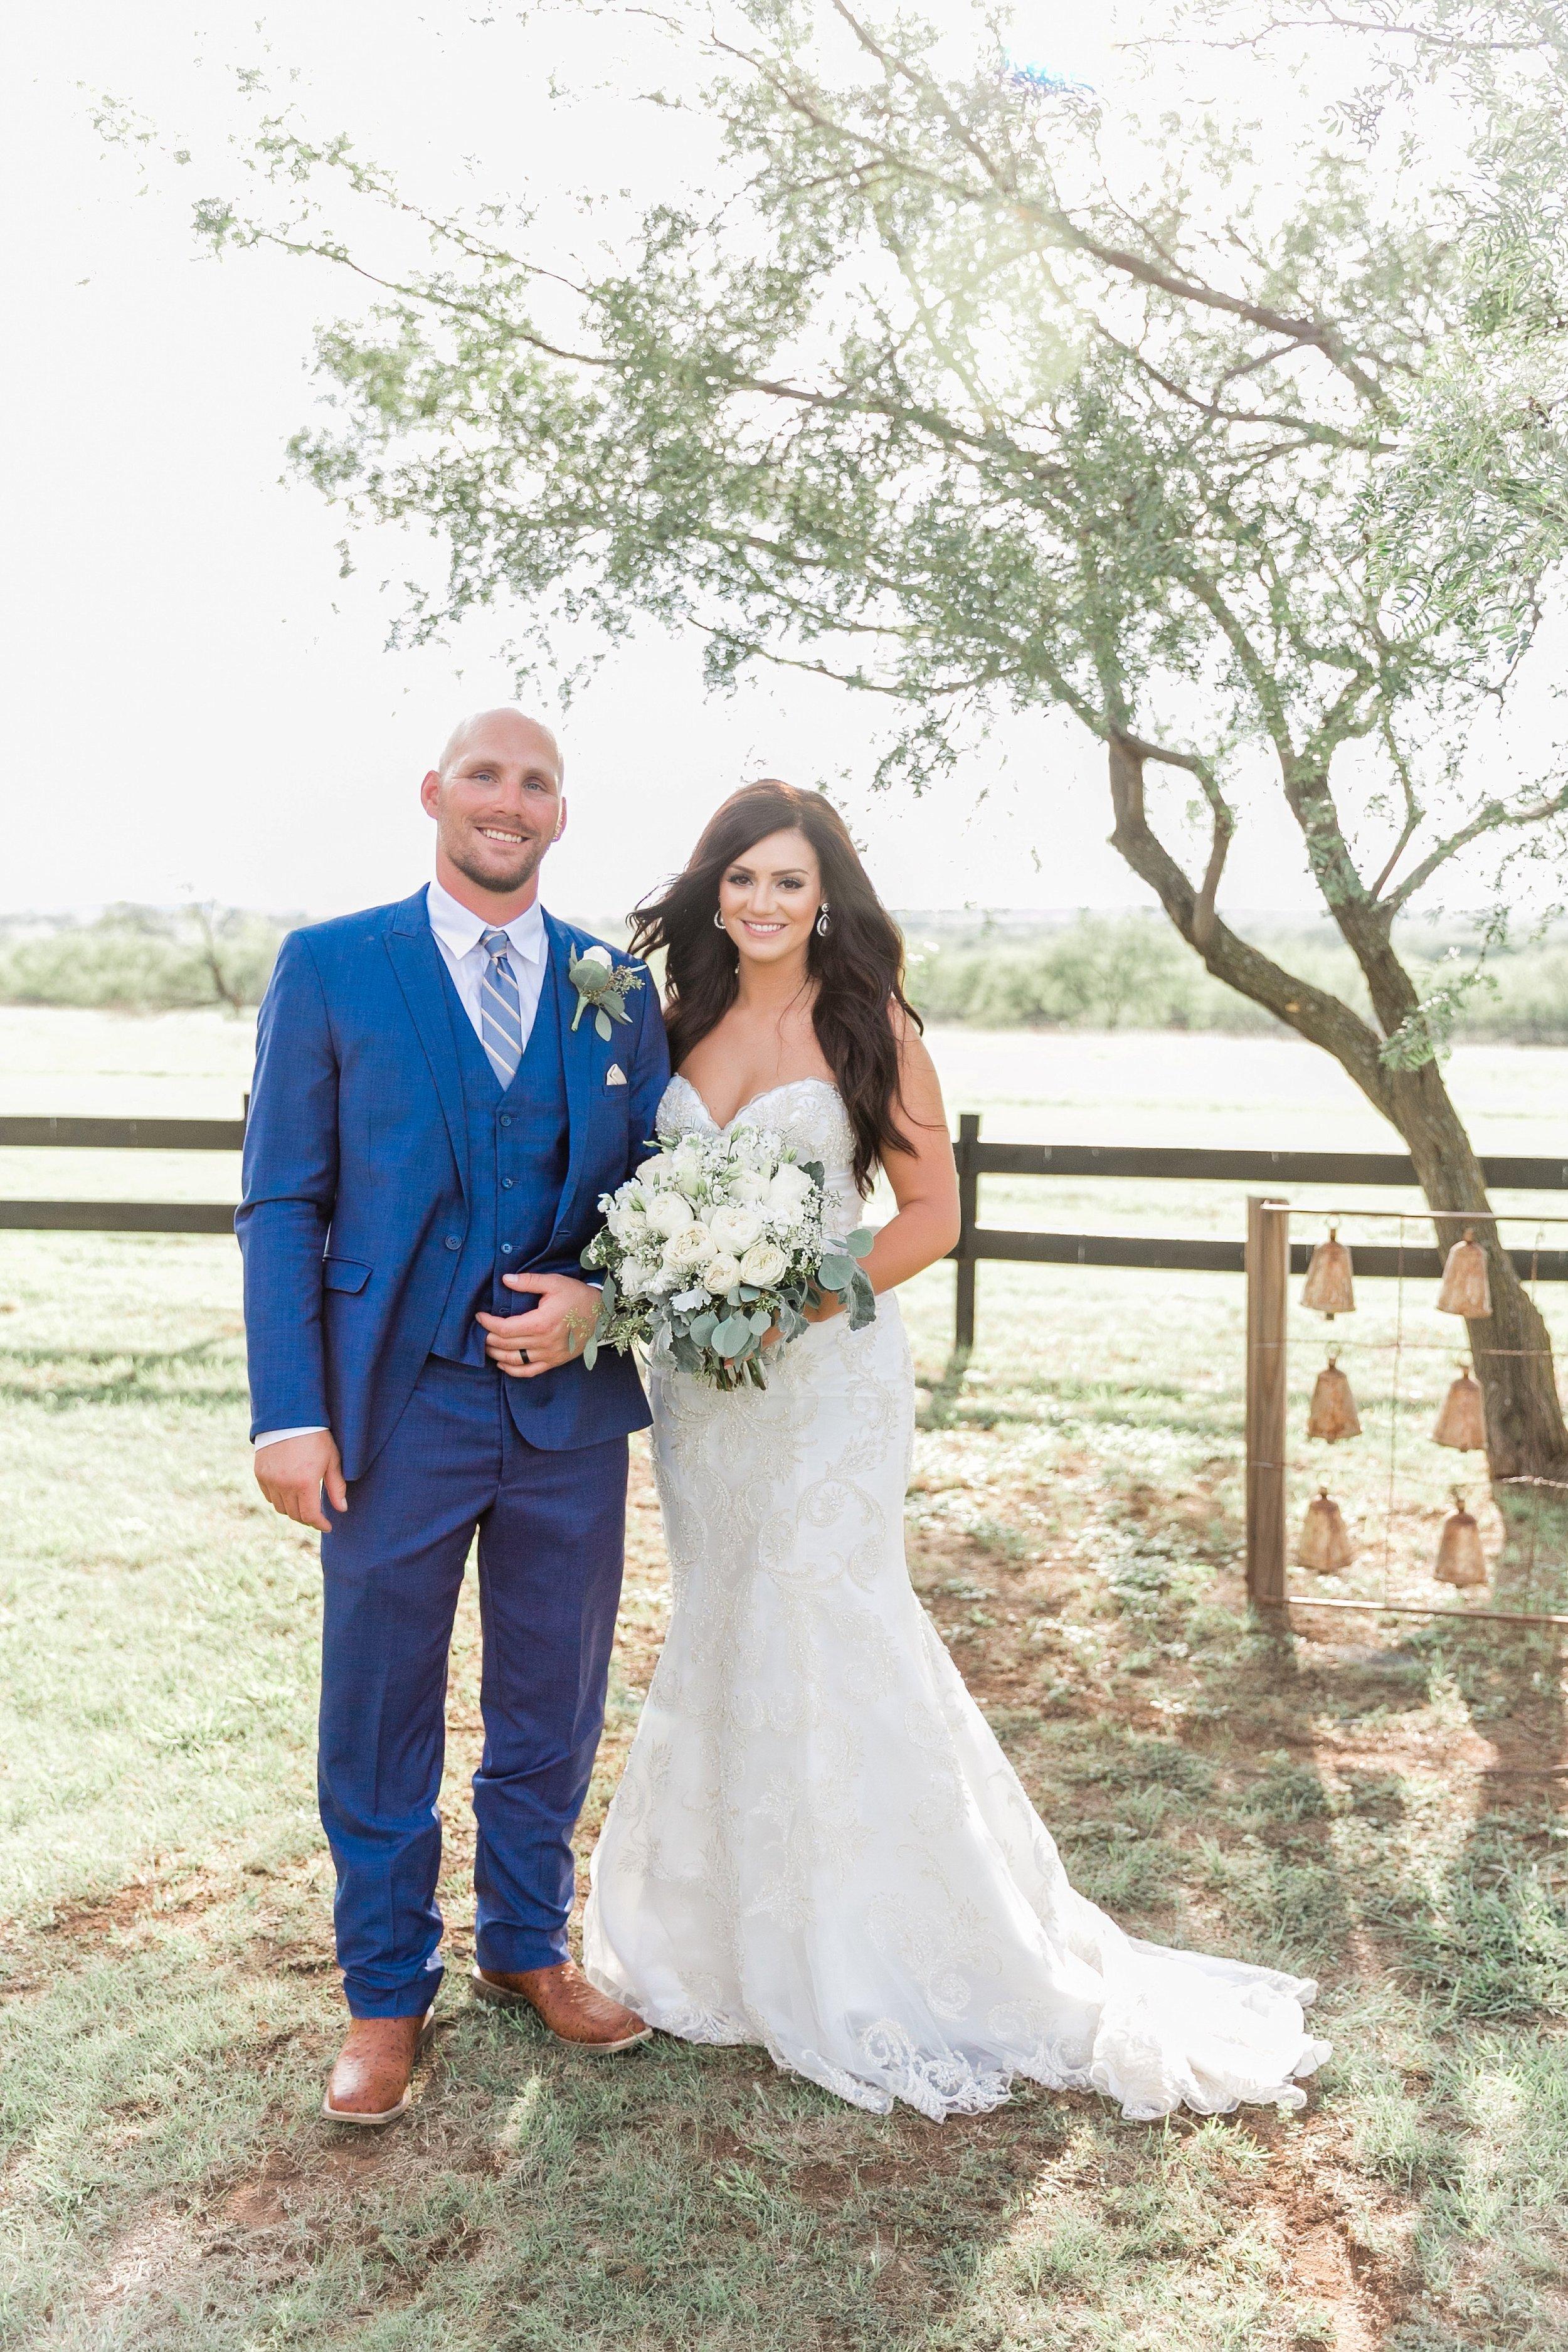 bailey-and-carl-coyote-ranch-resort-wedding-photographer-wichita-falls-texas-destination-wedding-0024.jpg